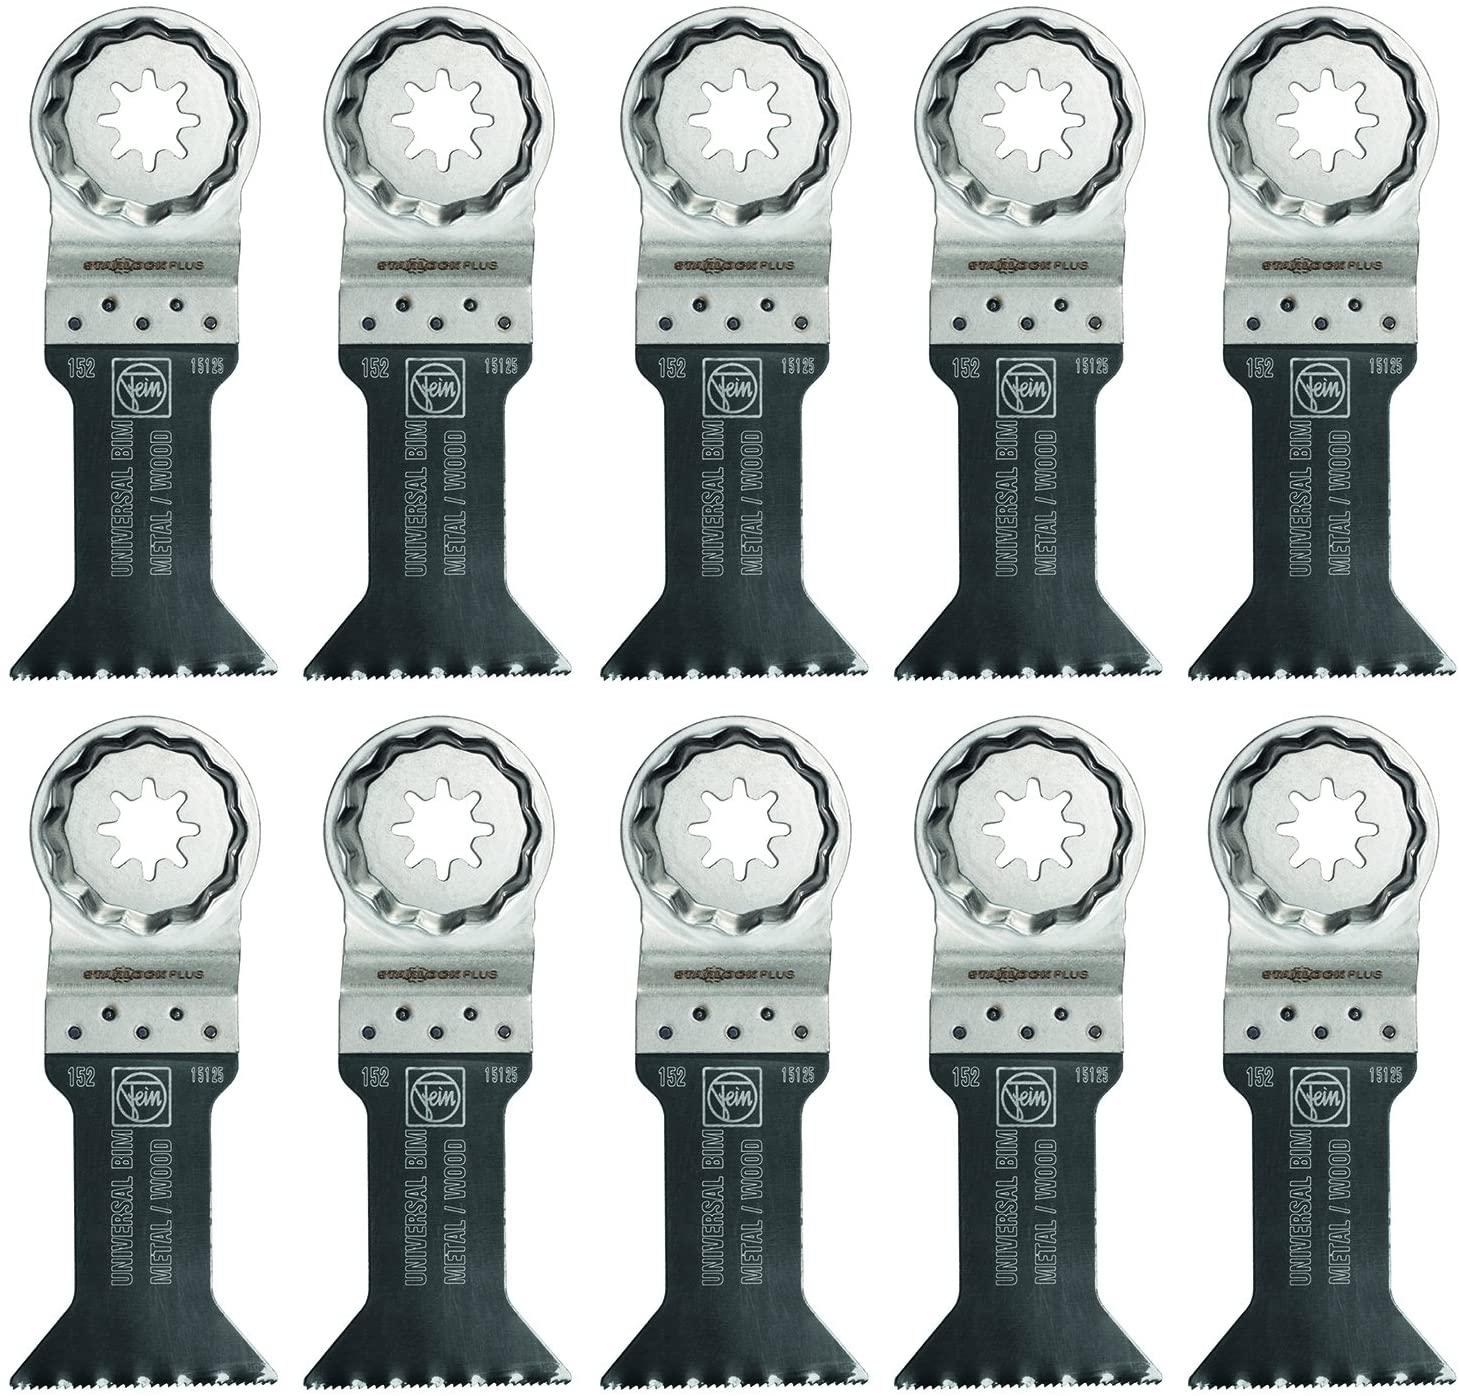 fein universal oscillating blade image